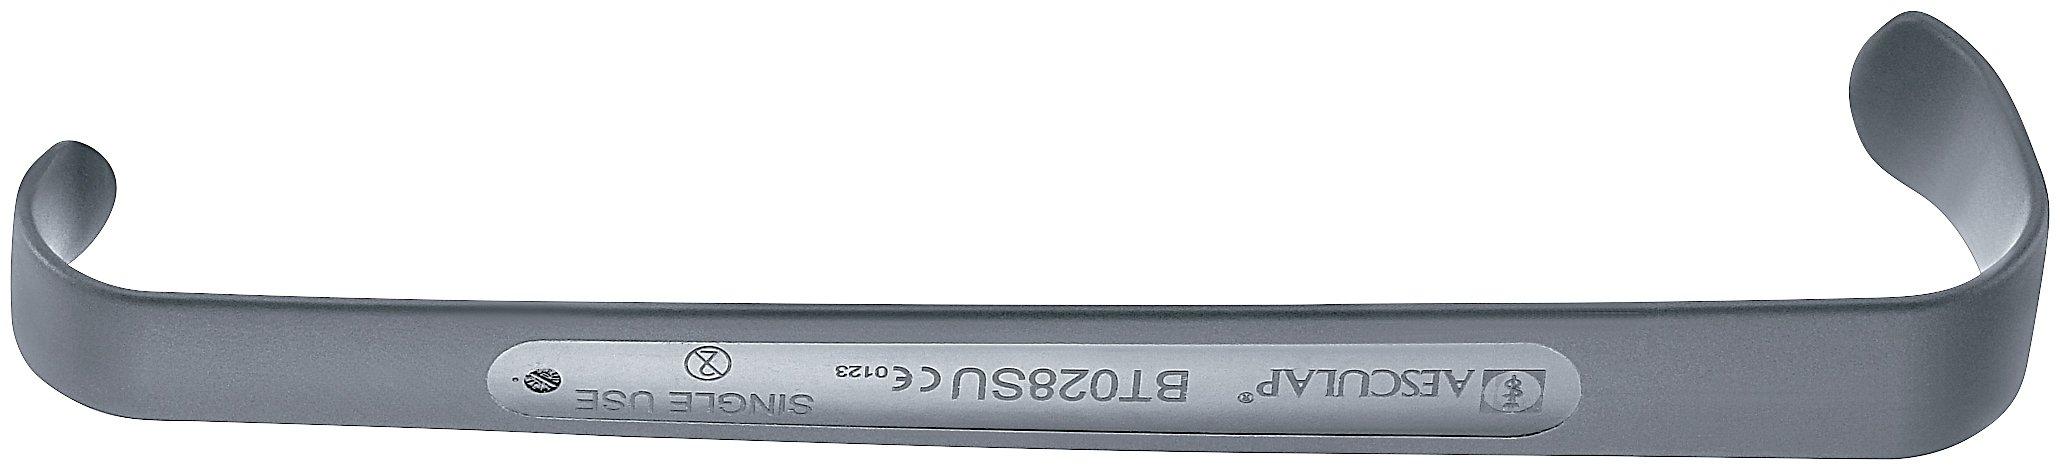 SUSI BT028SU Aesculap ROUX Retractor, 6-3/4'', Sterile (Pack of 20)